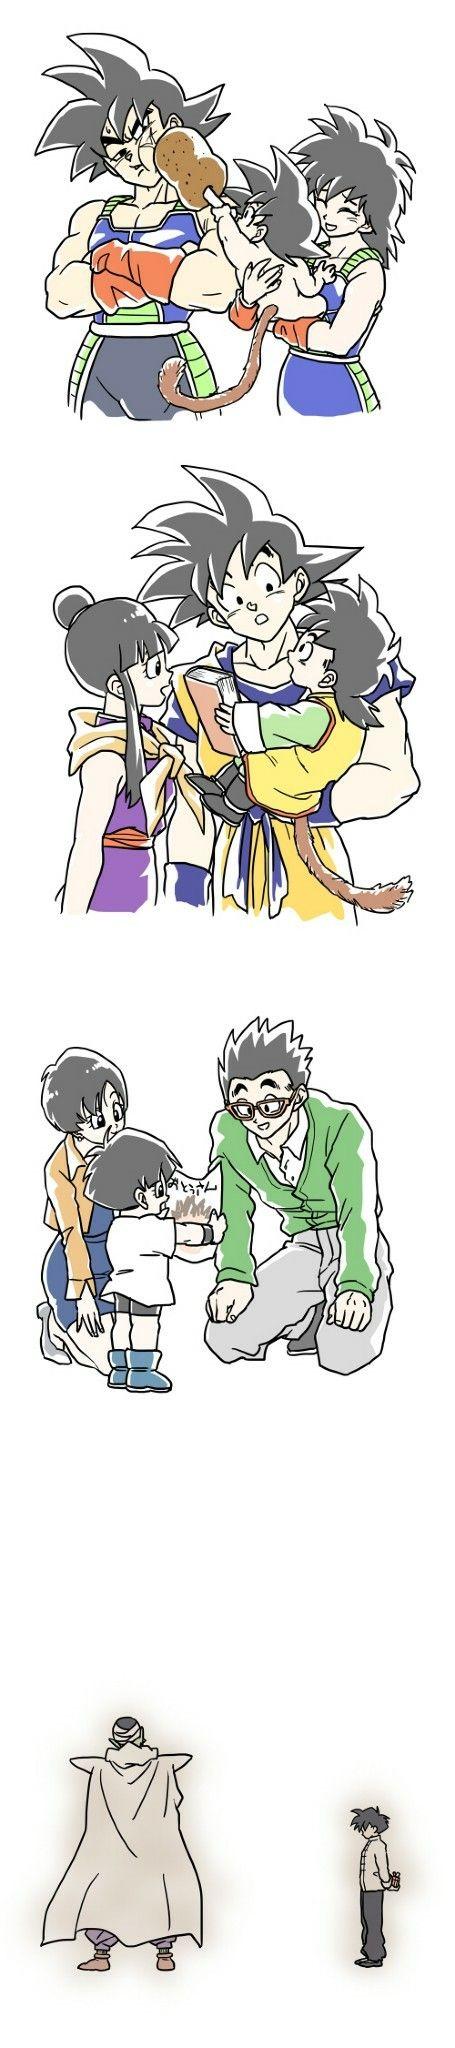 Goku and Chichi's Family